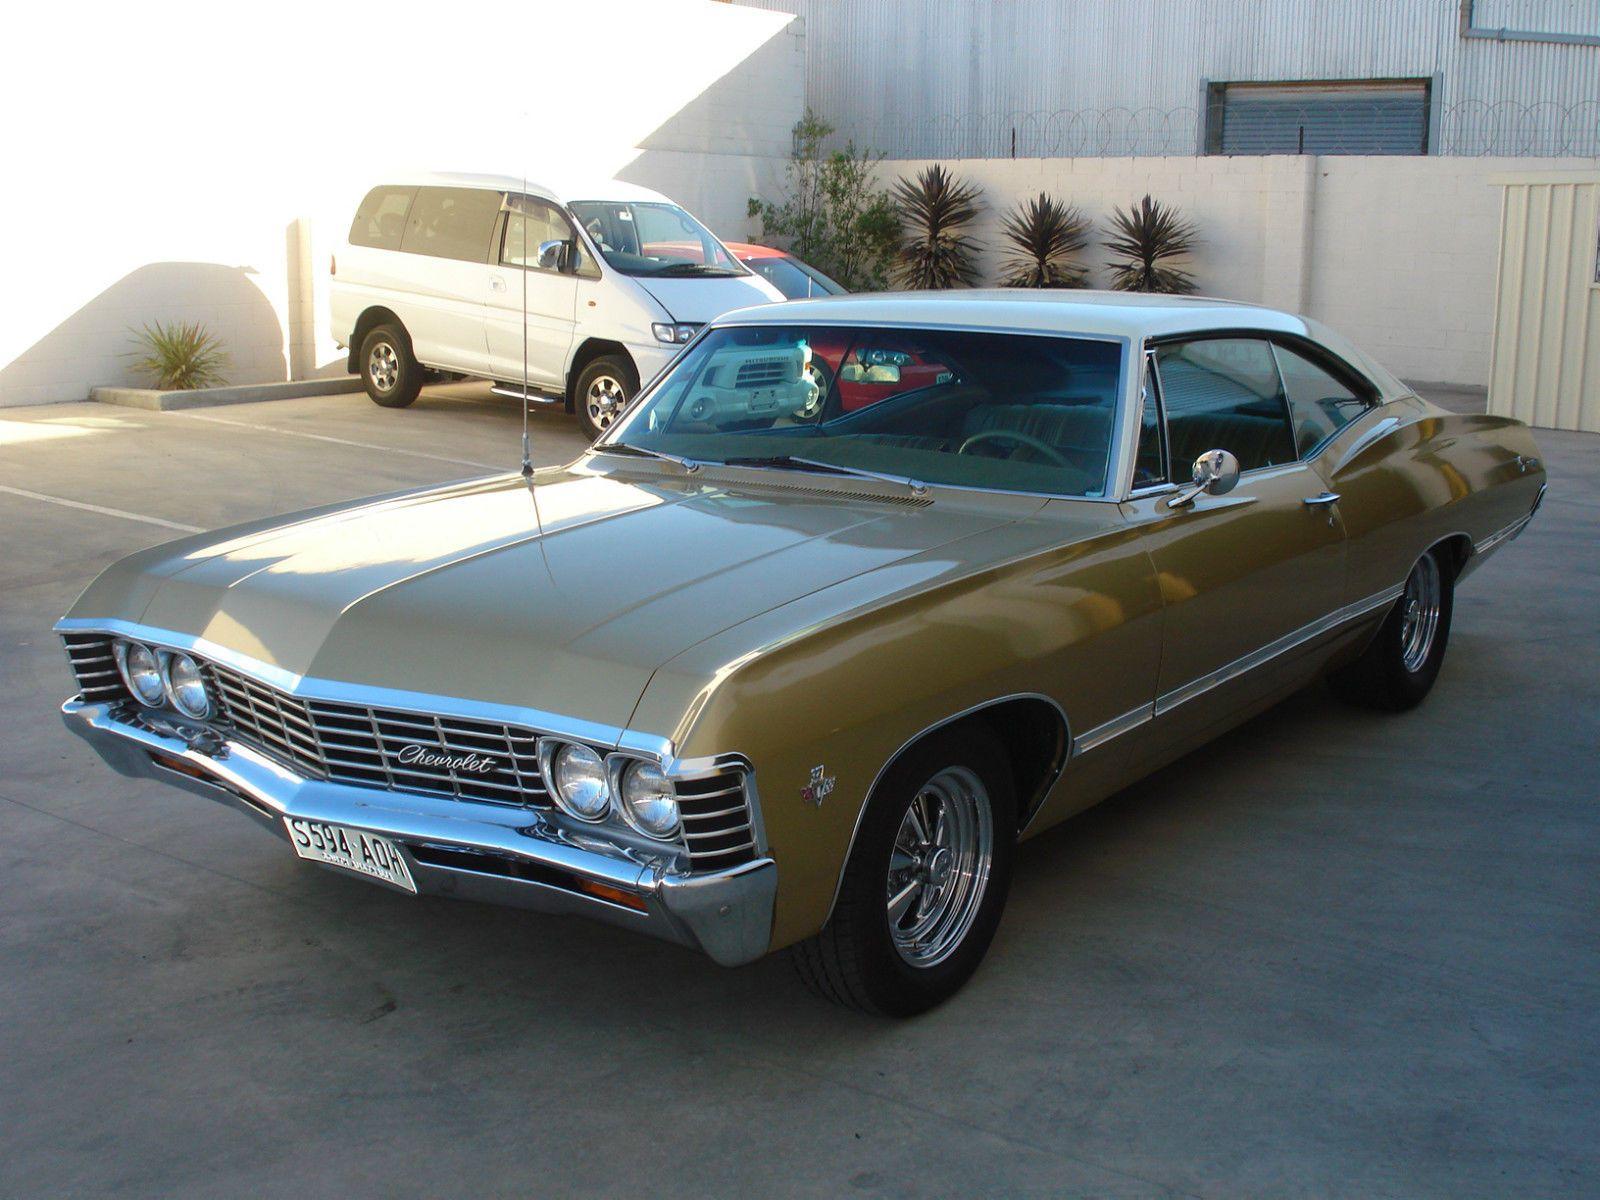 1967 Chevrolet Impala 2 Door Pillarless Sport Coupe Chevrolet